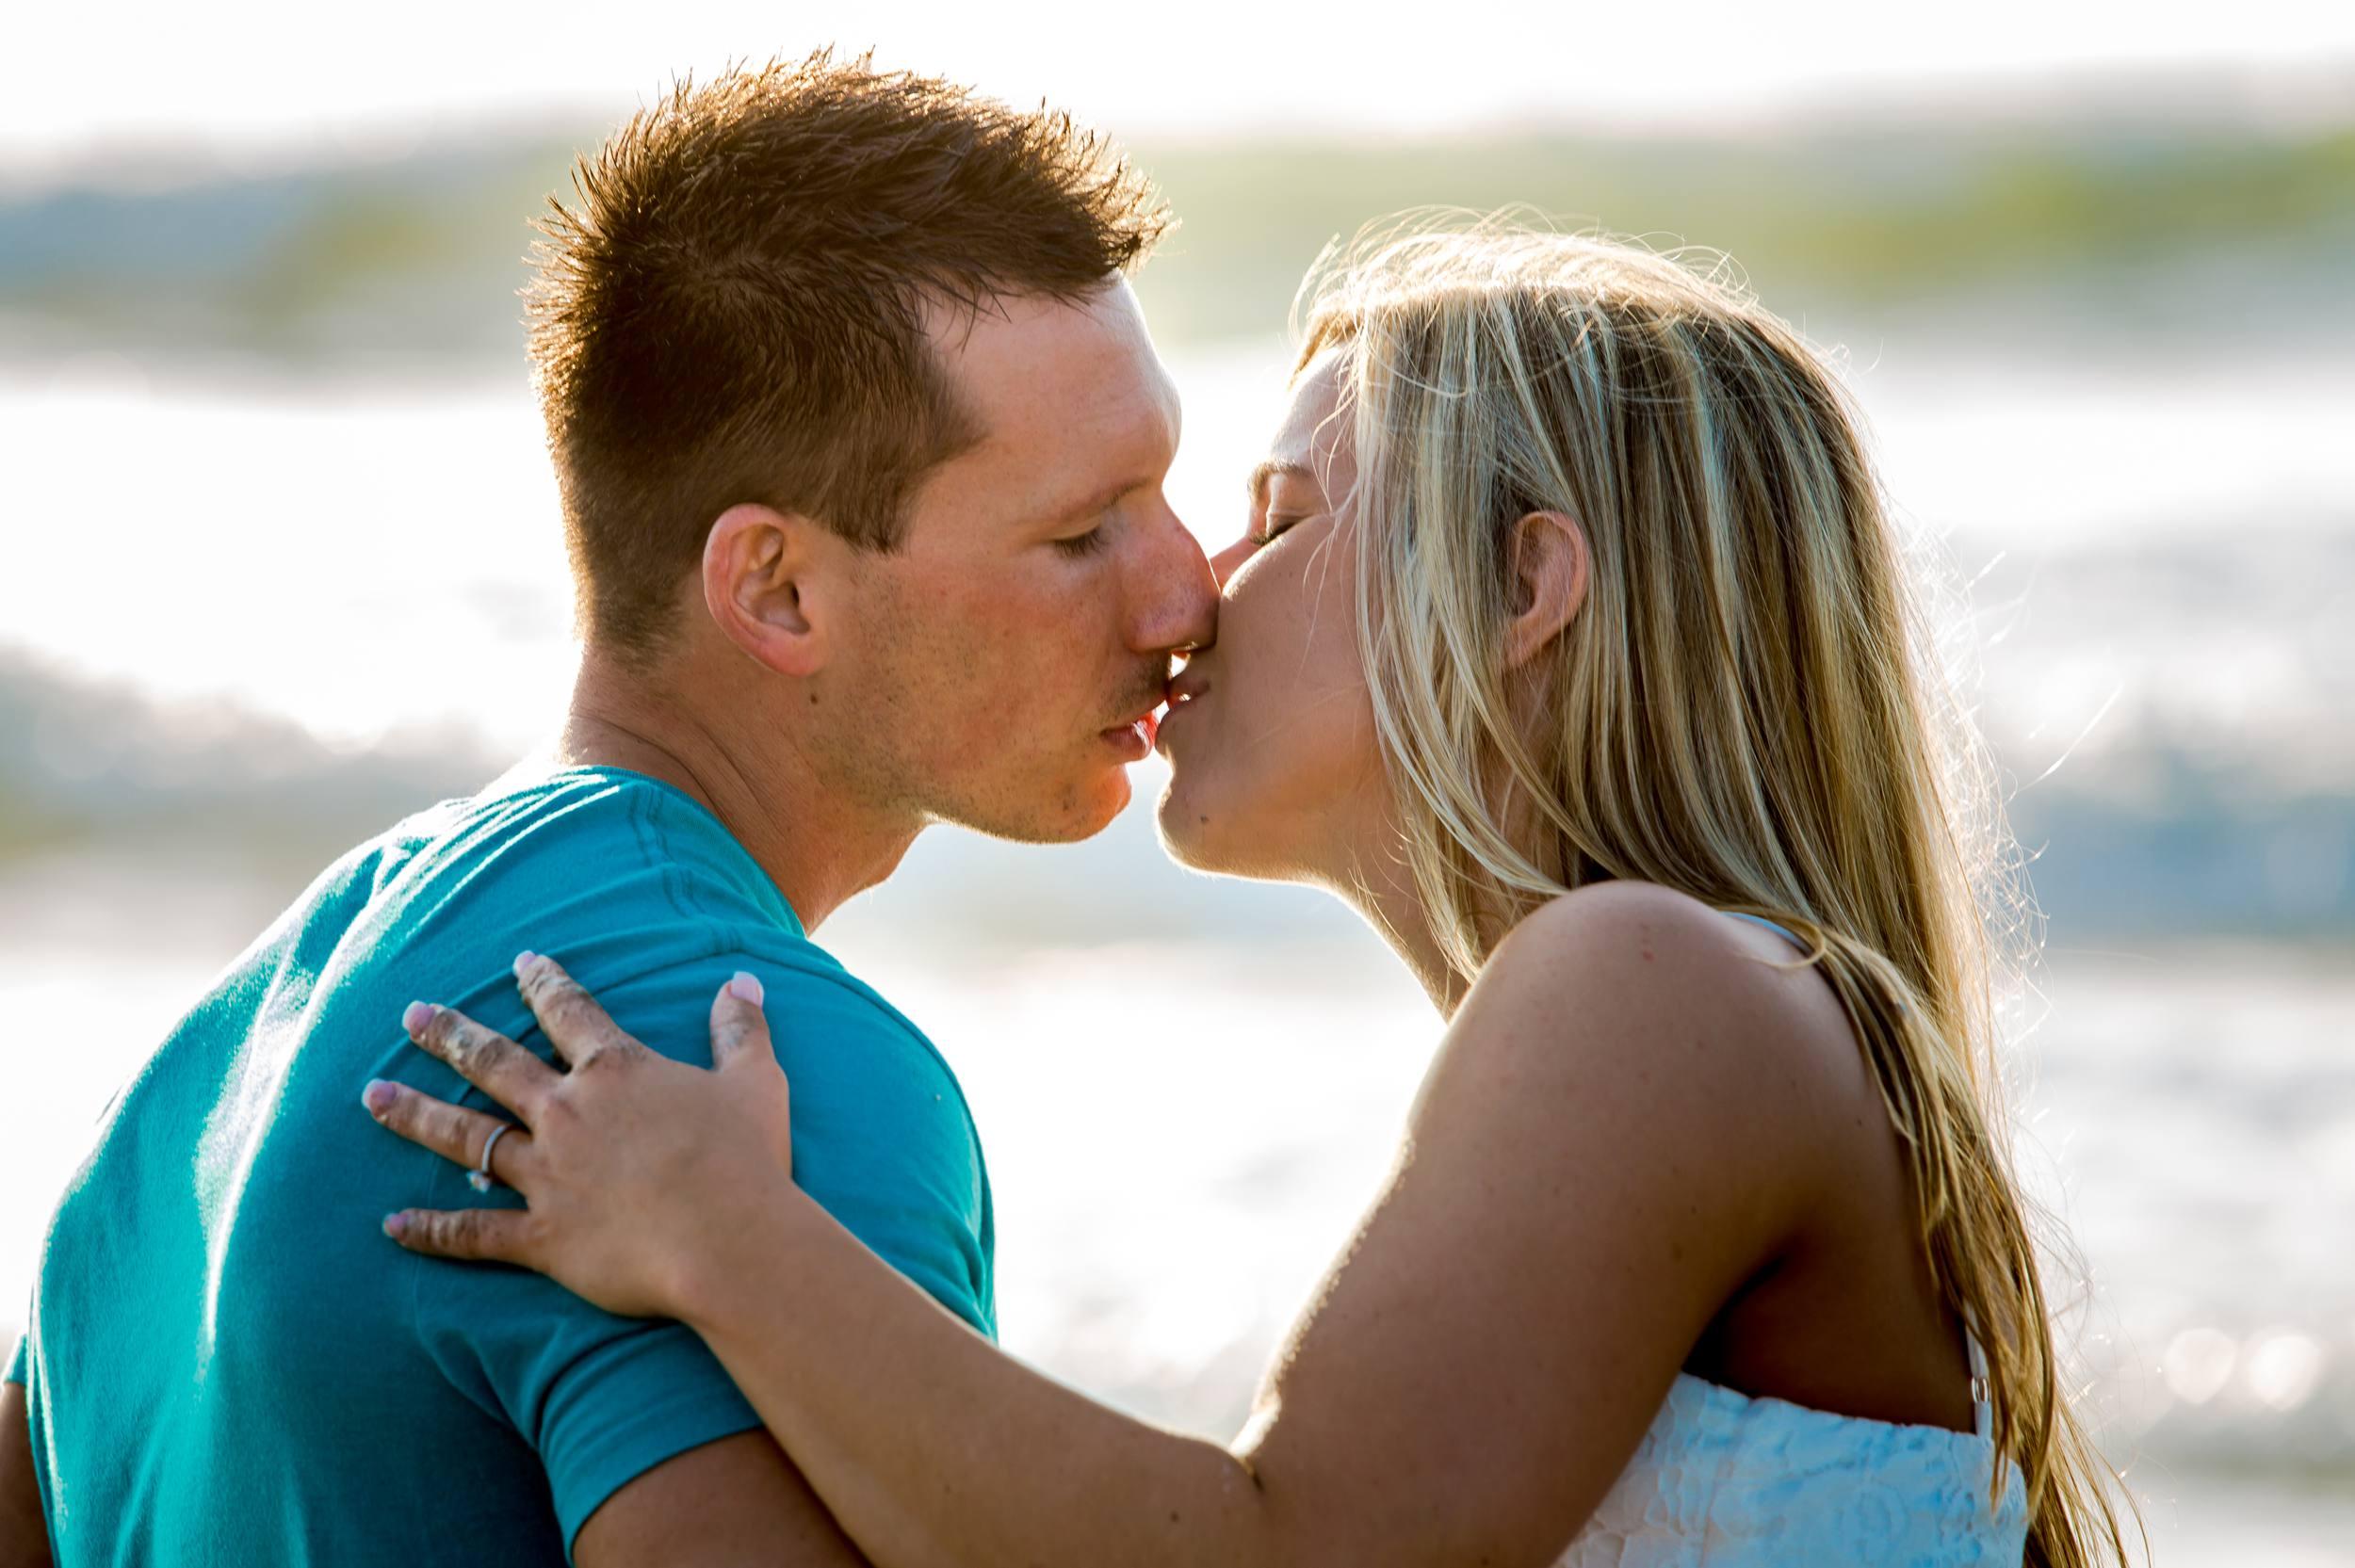 Lori Wilson Park Cocoa Beach Sunrise Engagement Session Mint Green dress- Bri 15.jpg